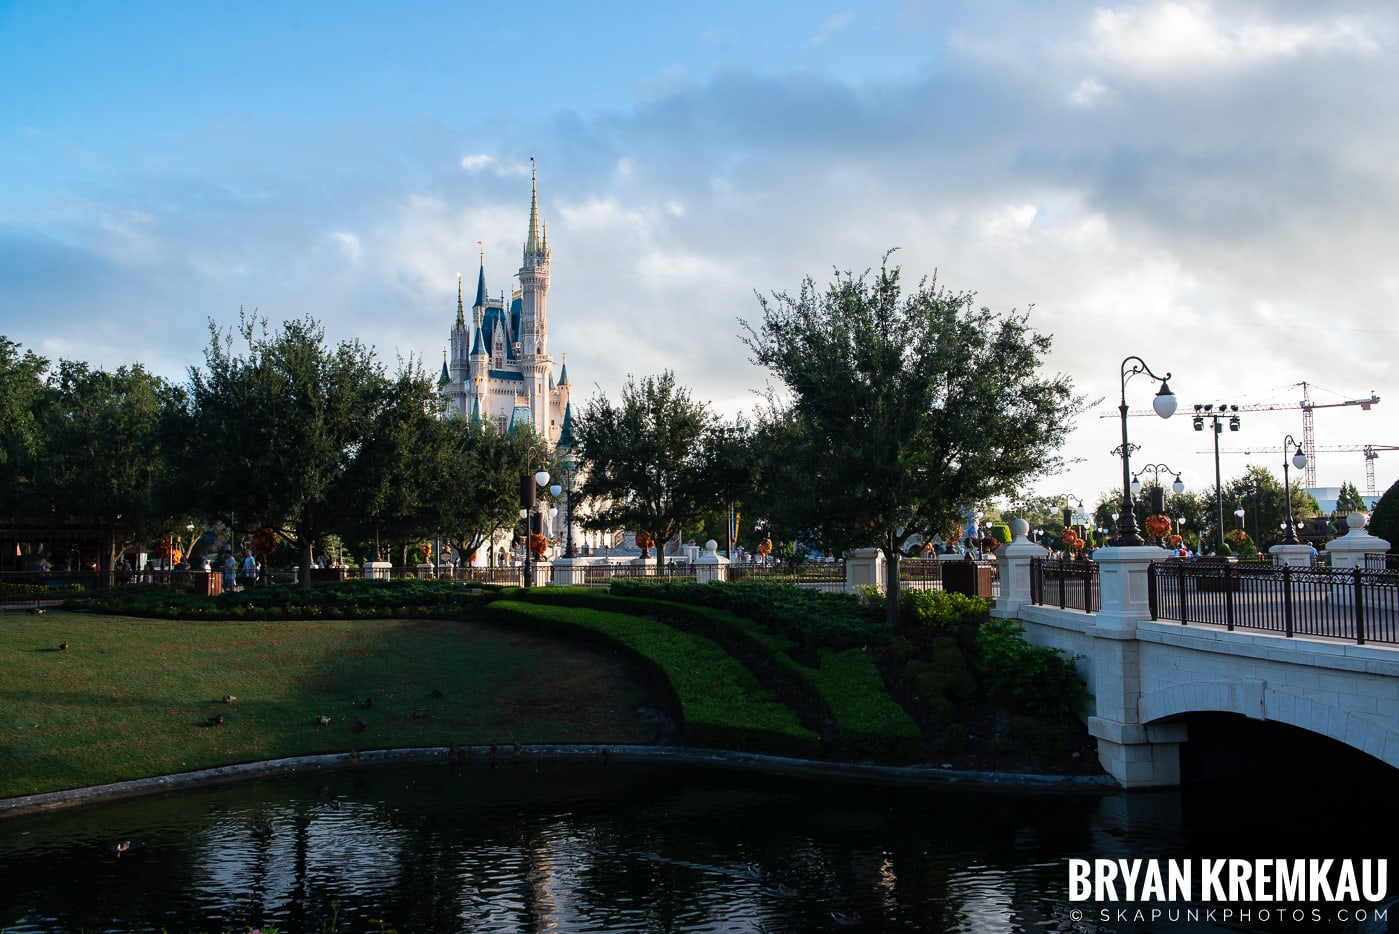 Walt Disney World Vacation: Day 6 (Magic Kingdom, Epcot, Disney's Hollywood Studios) - 10.4.19 (42)